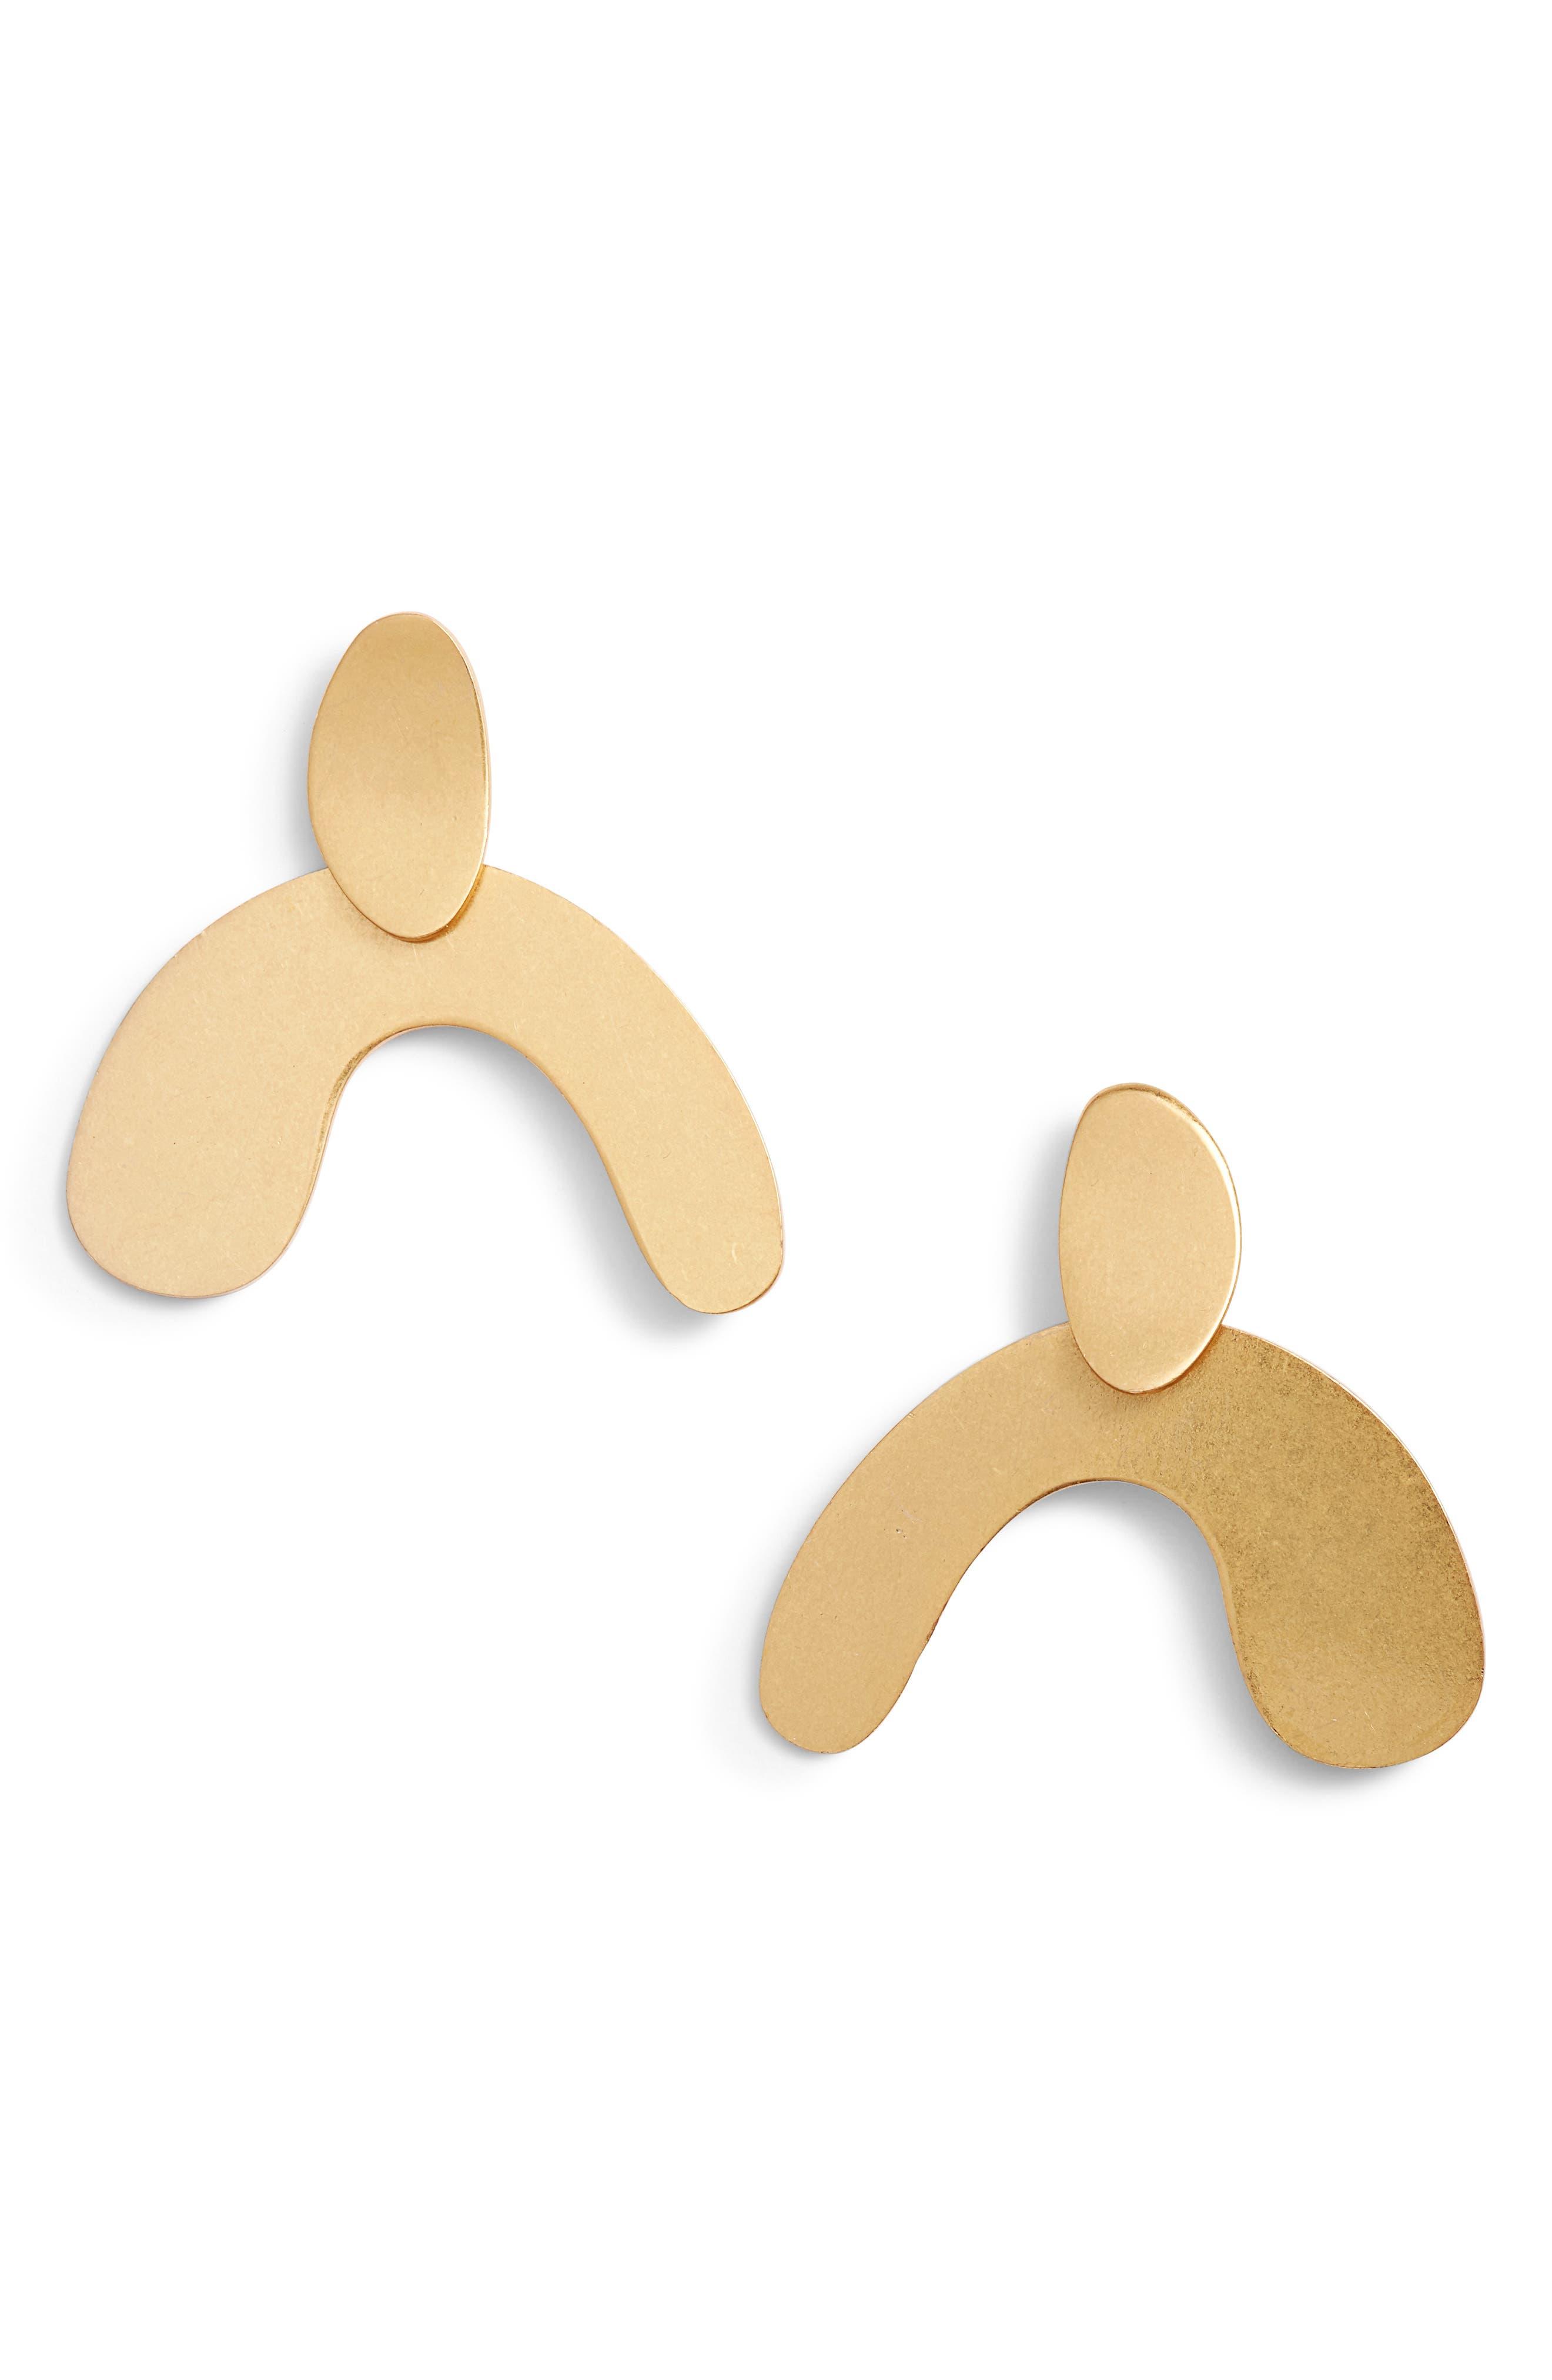 Madewell Organic Shape Earrings